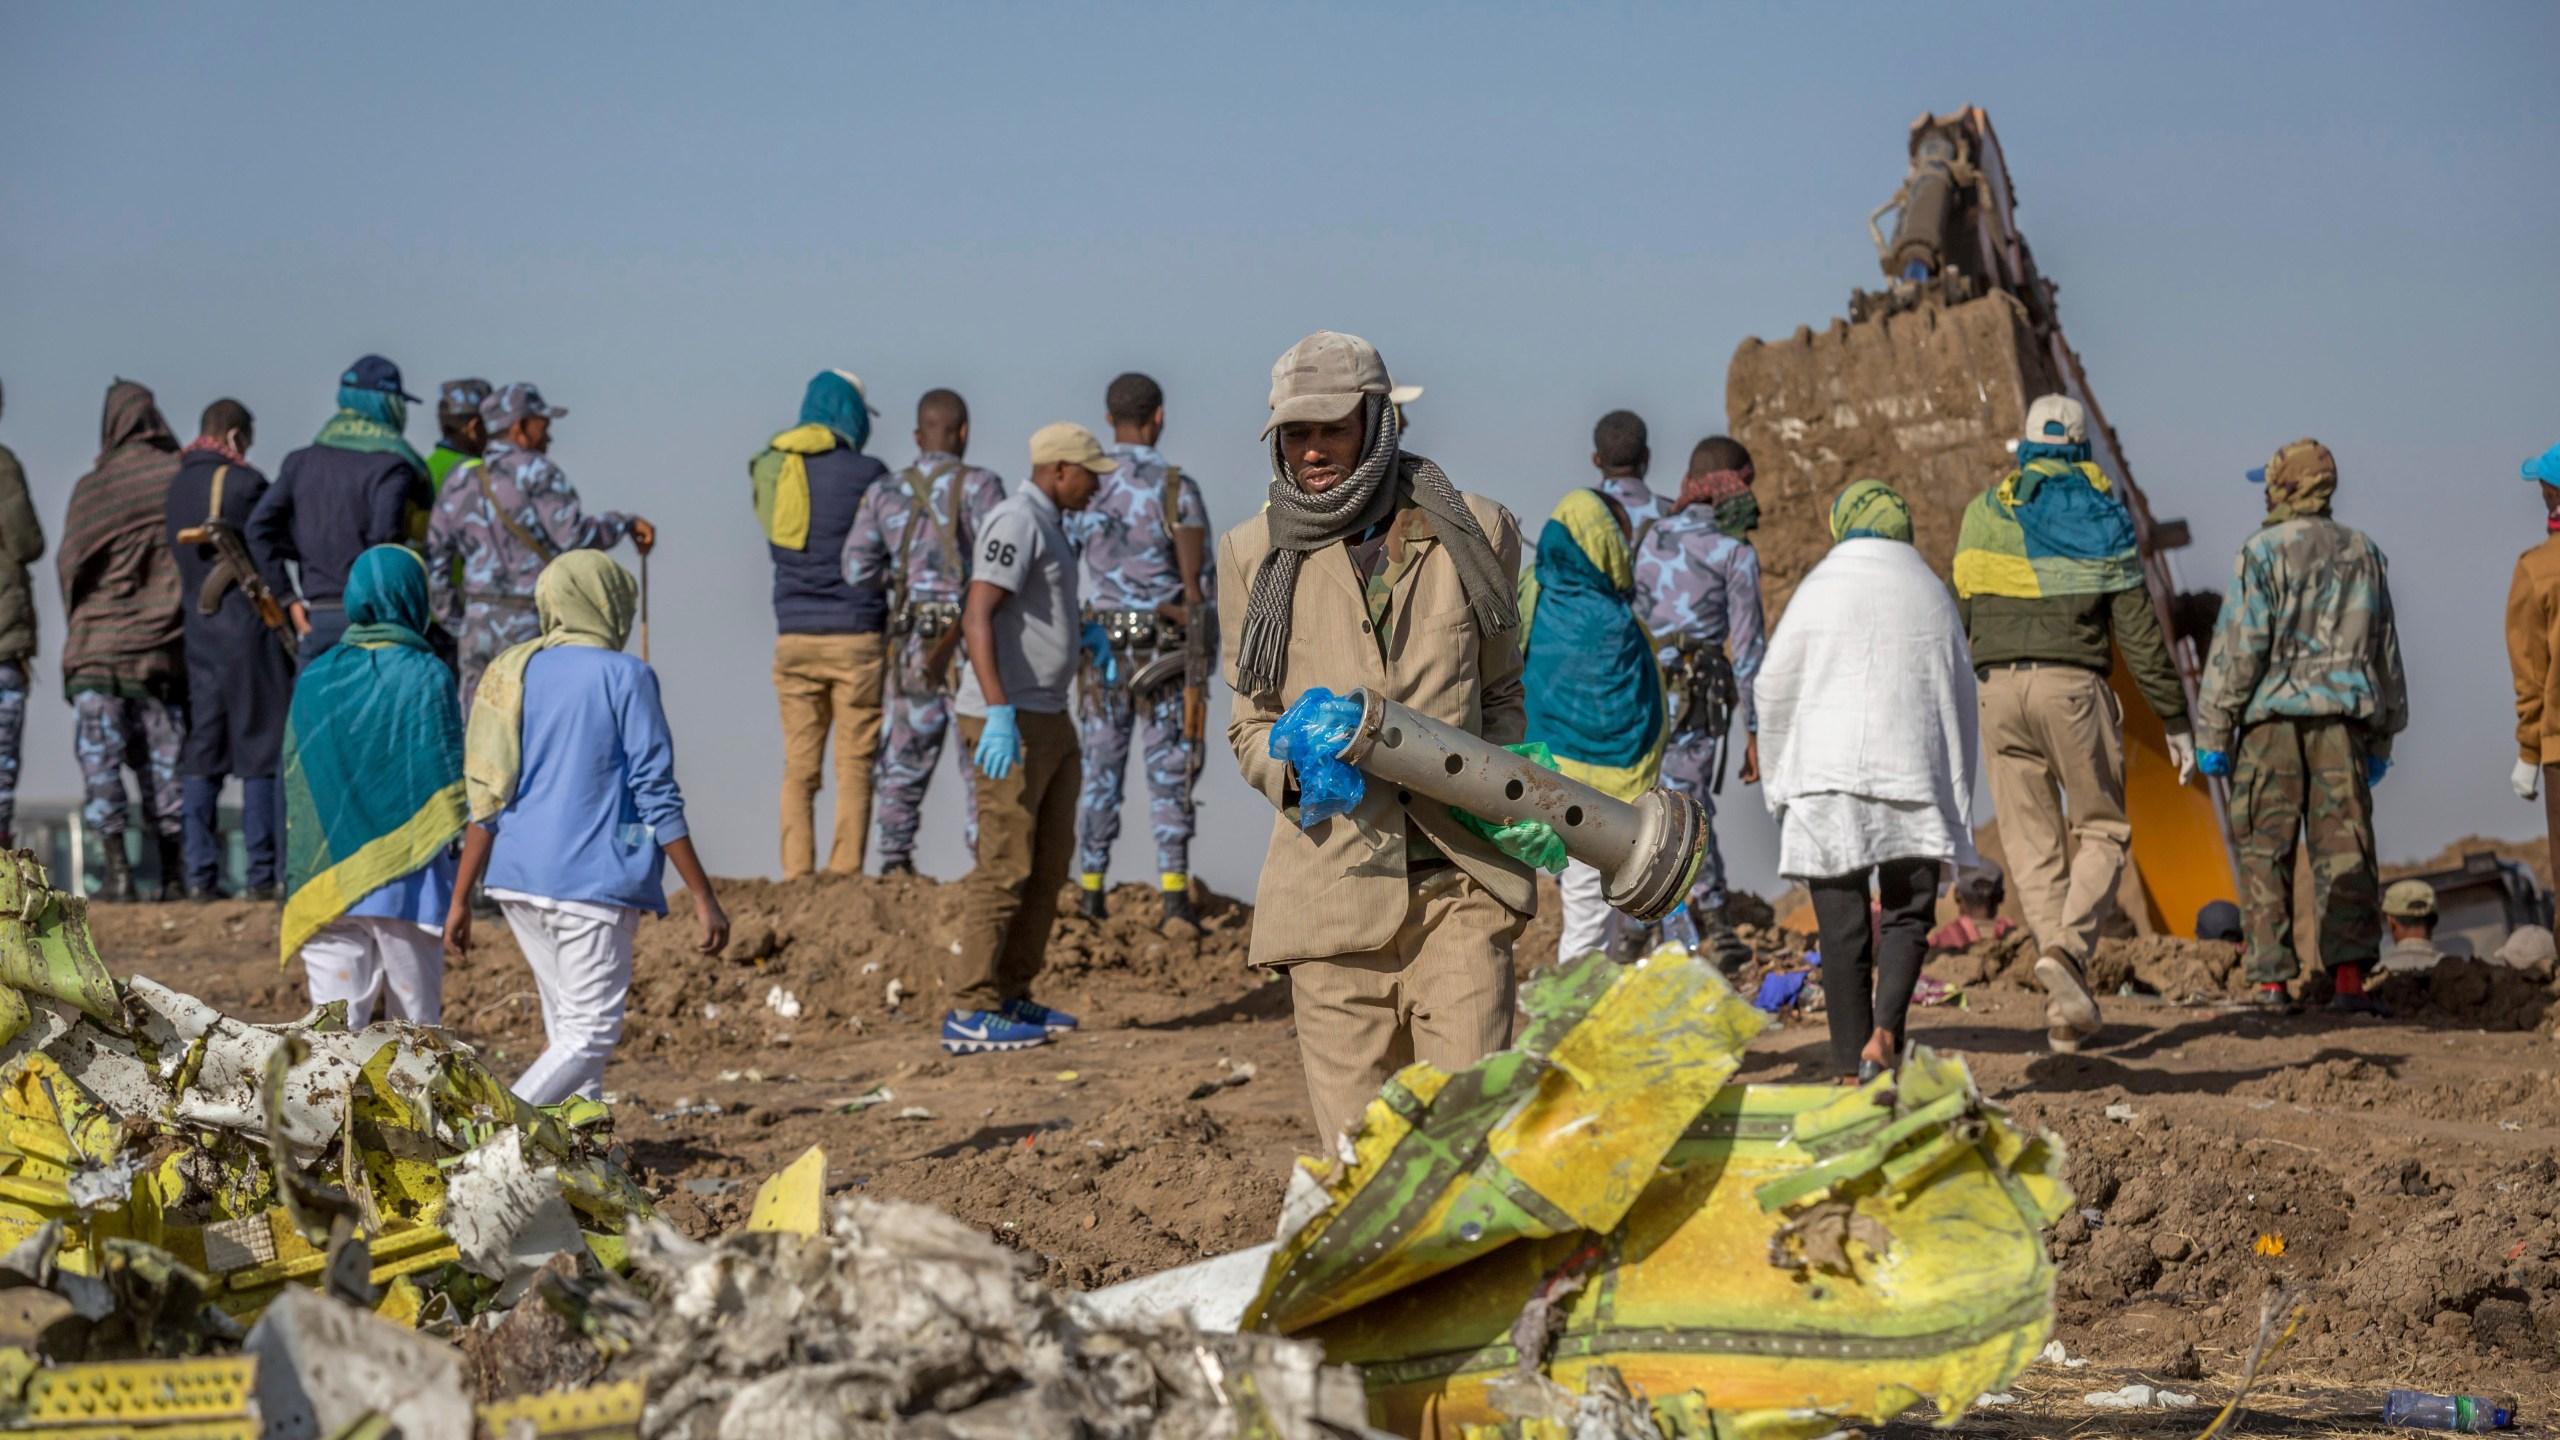 Ethiopia_Plane_Crash_27004-159532.jpg43063608